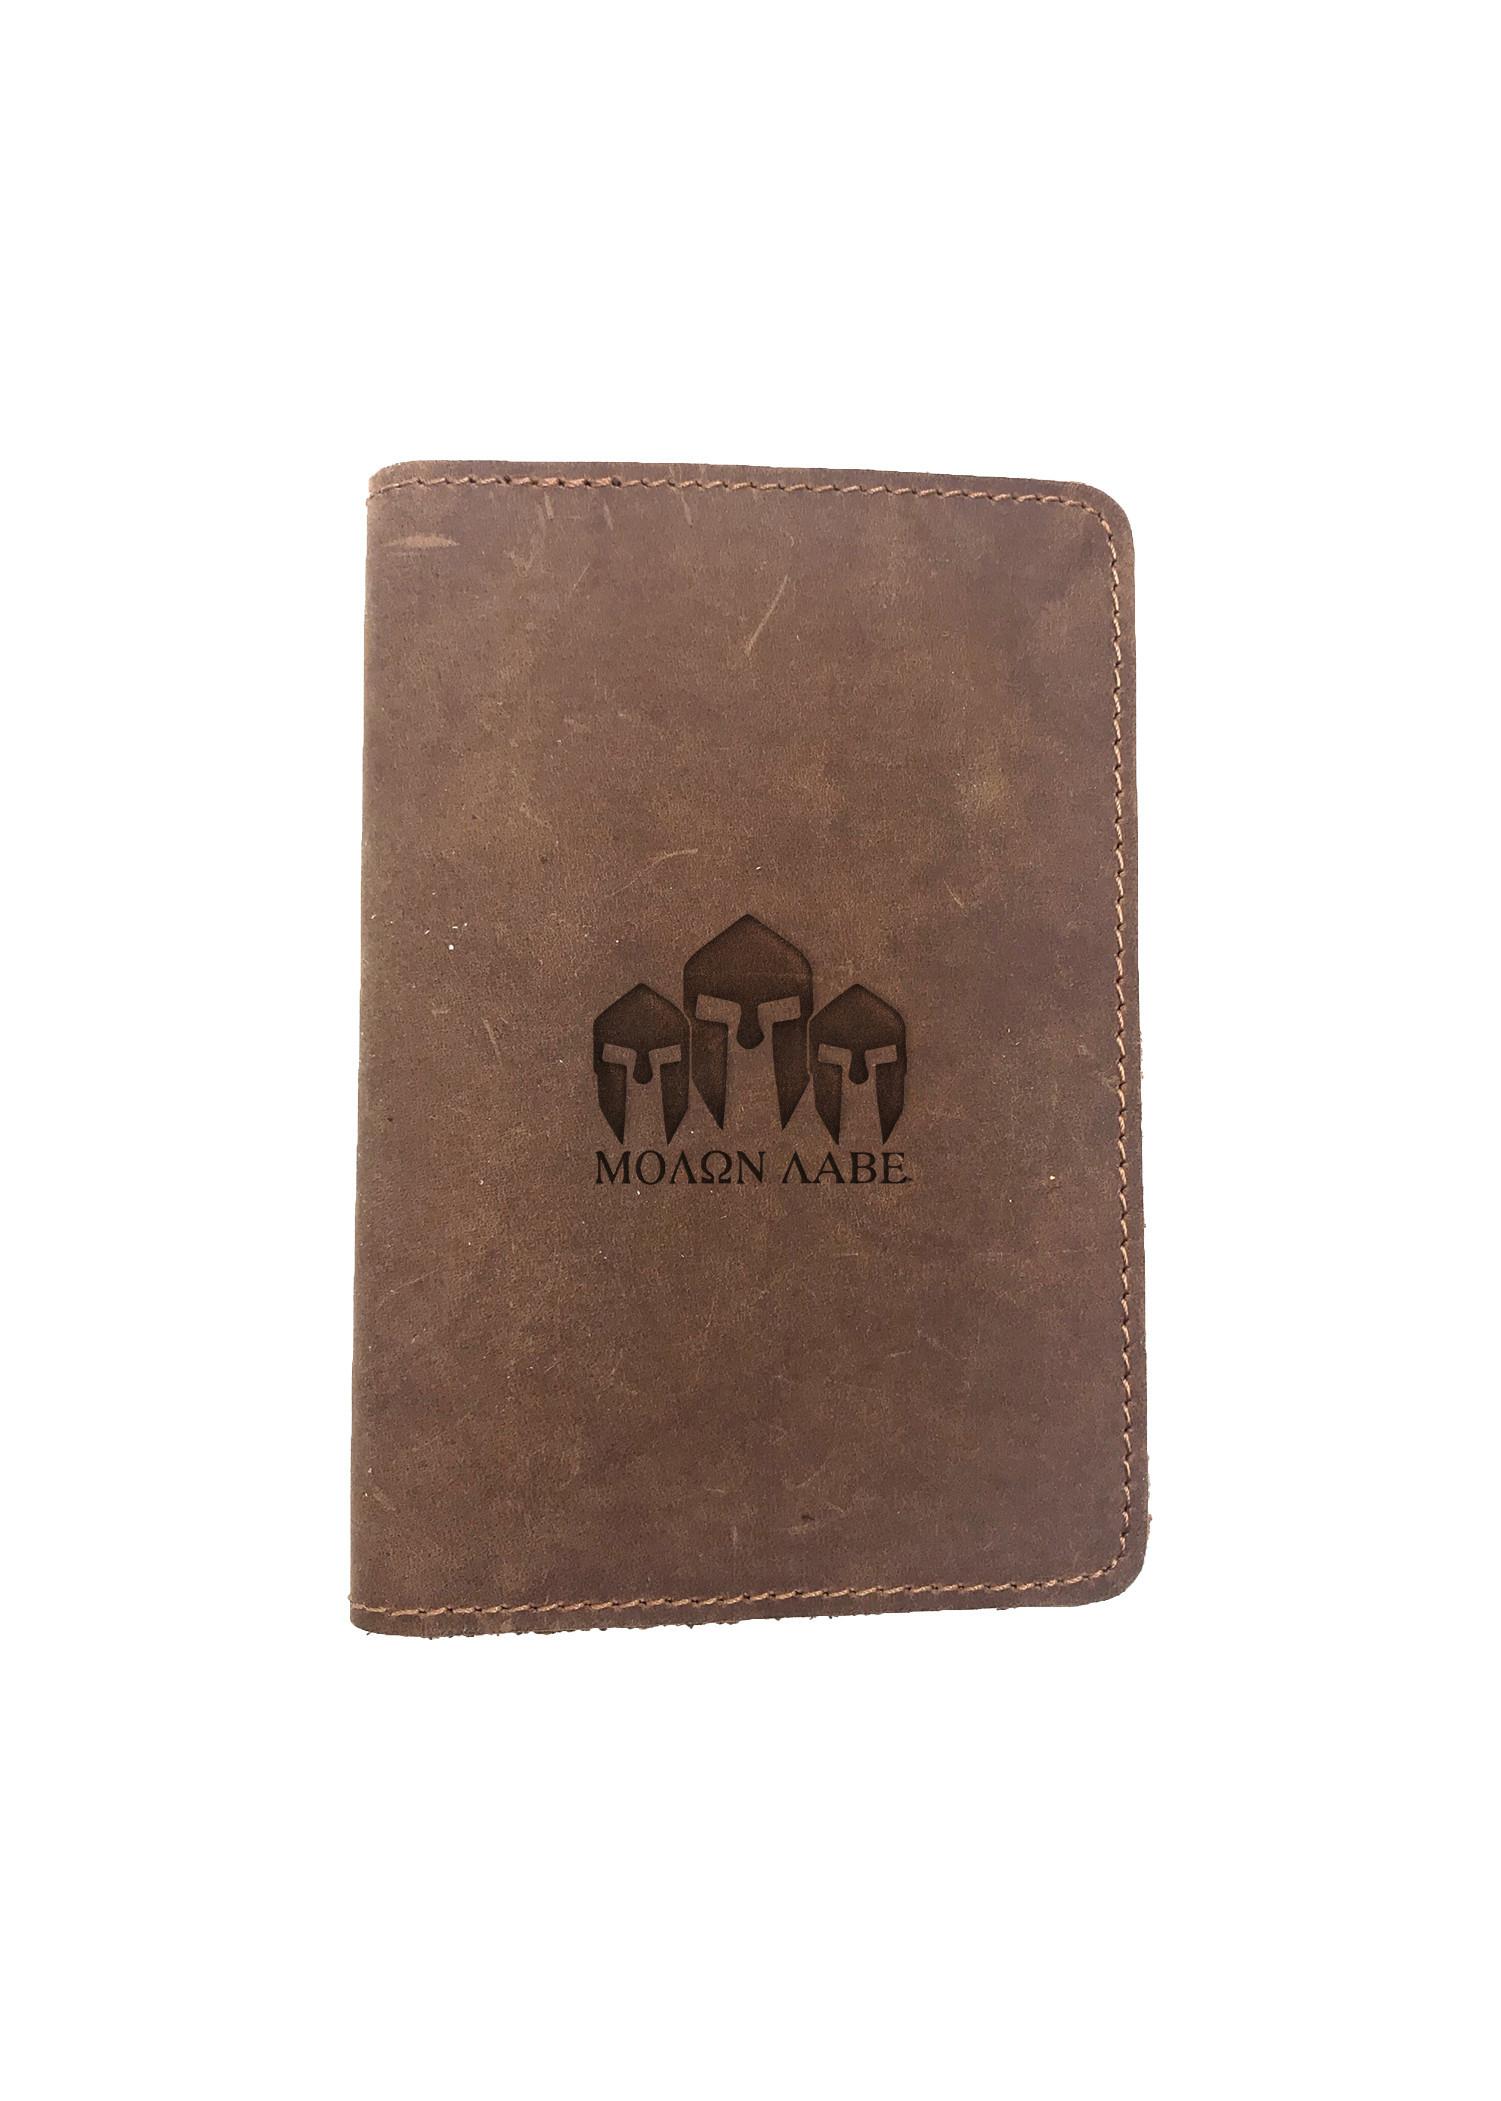 Passport Cover Bao Da Hộ Chiếu Da Sáp Khắc Hình Hình MOLON LABE (BROWN)